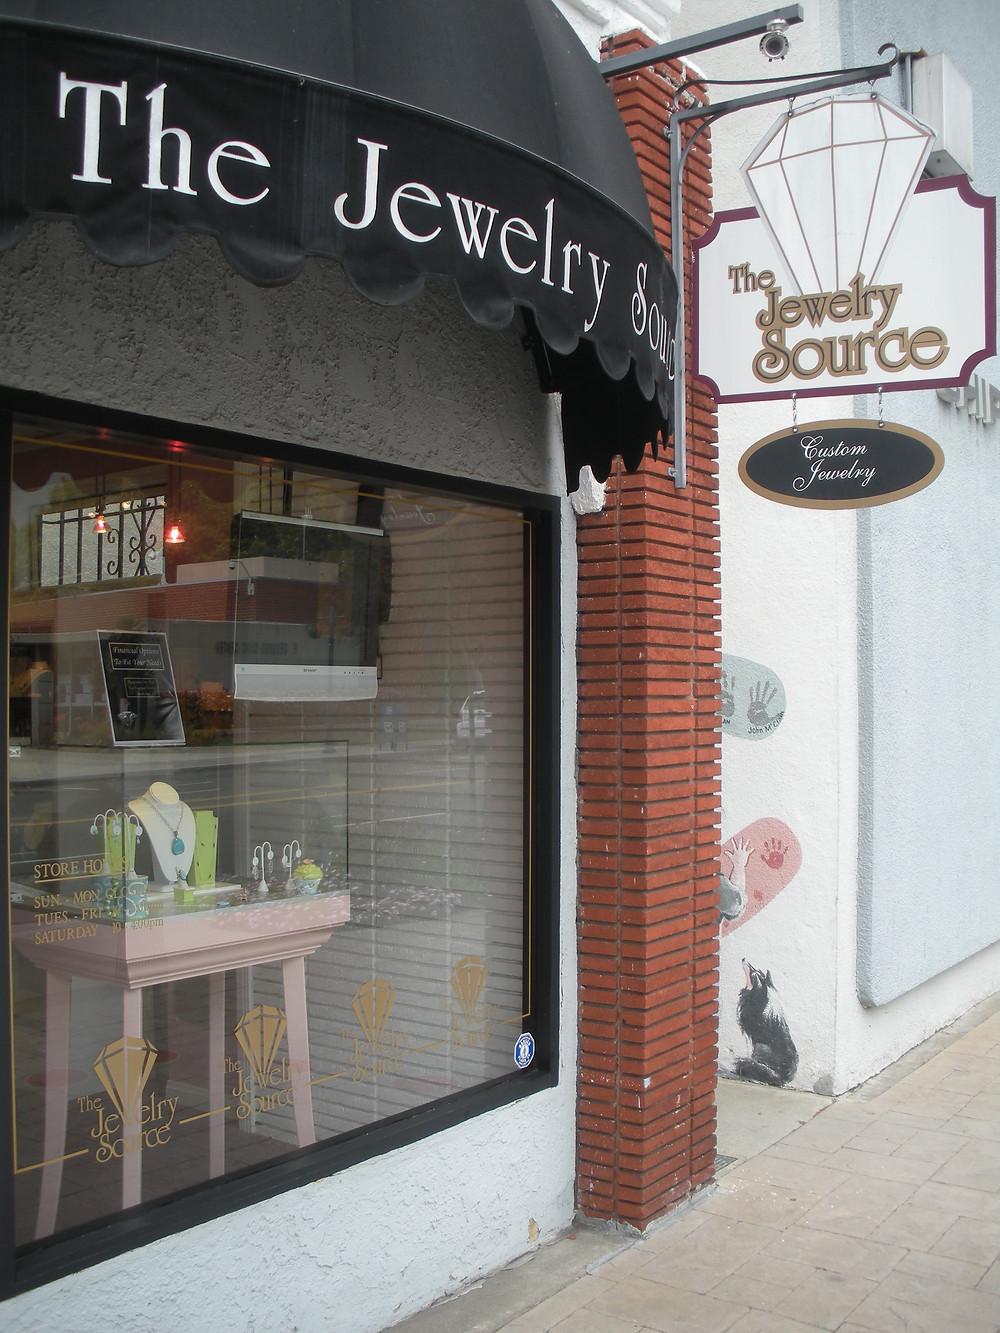 The Jewelry Source in El Segundo